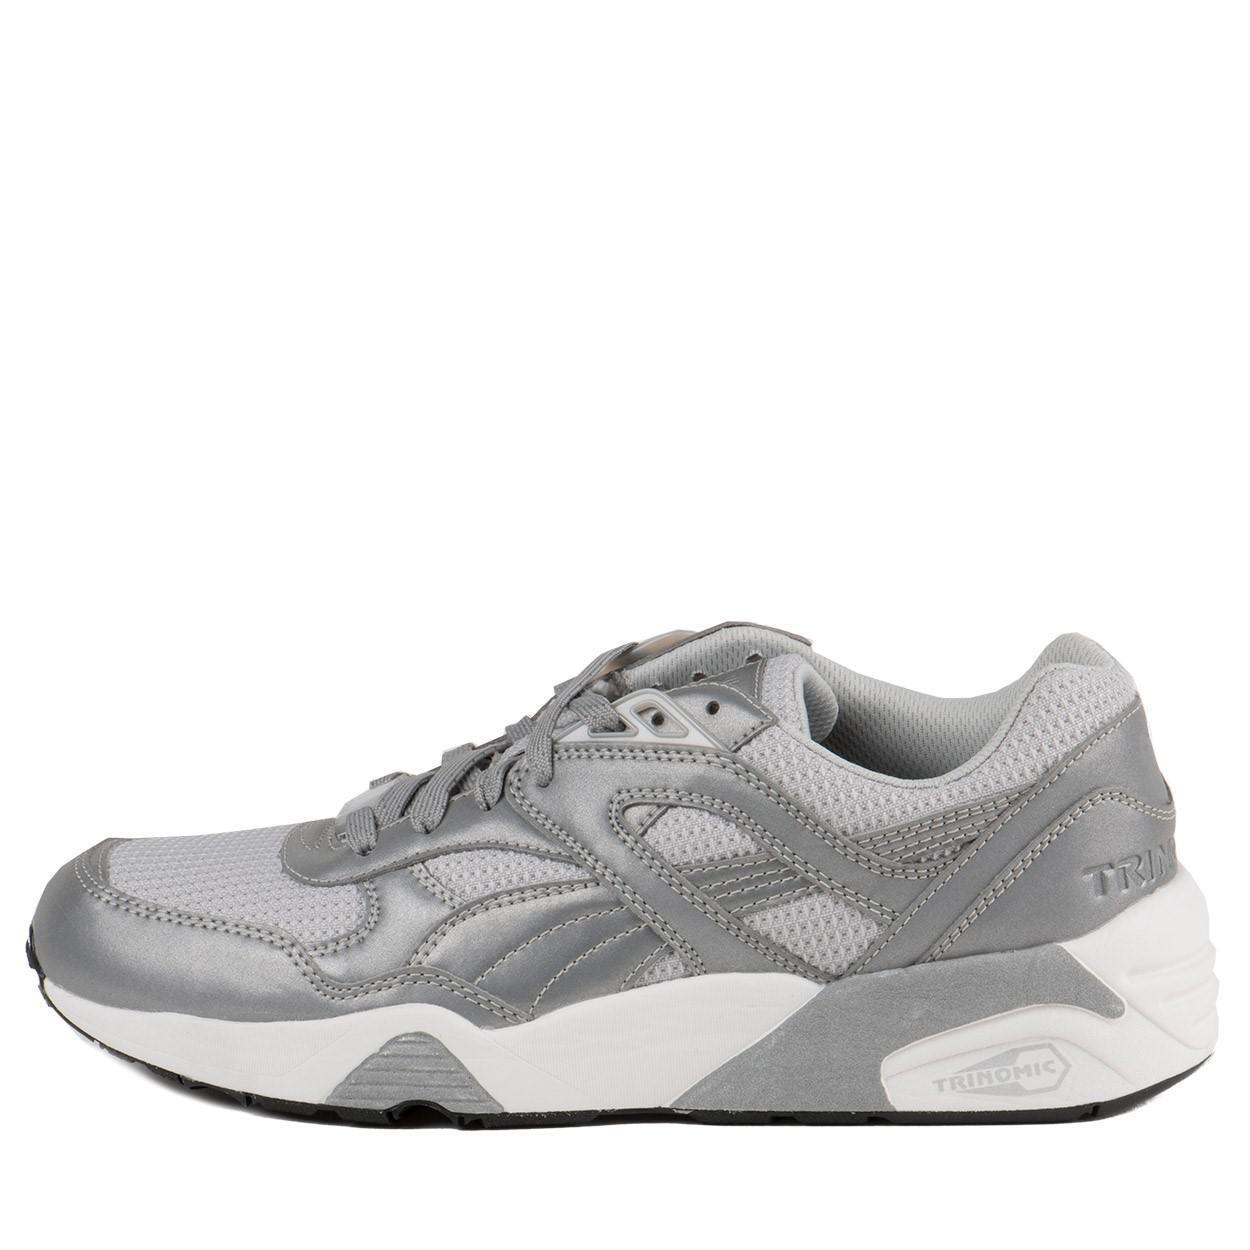 Puma R698 Reflective Metallic Grey Men Sz 7.5 - 10